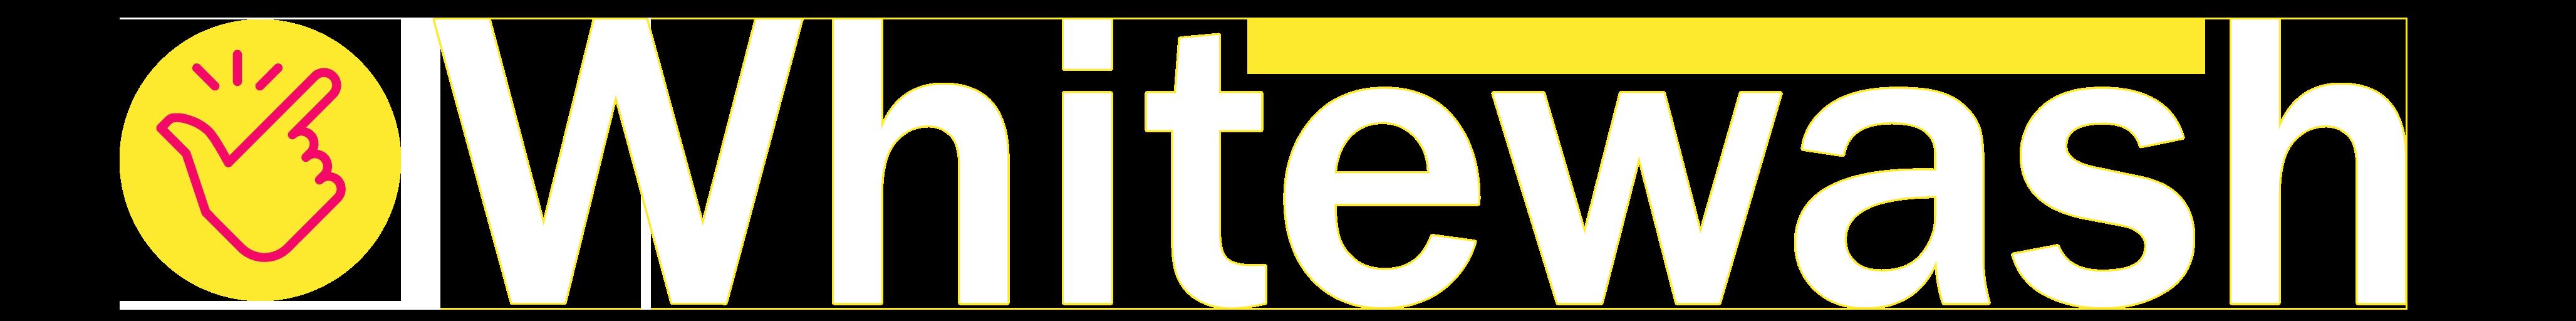 logo whitewash contornato